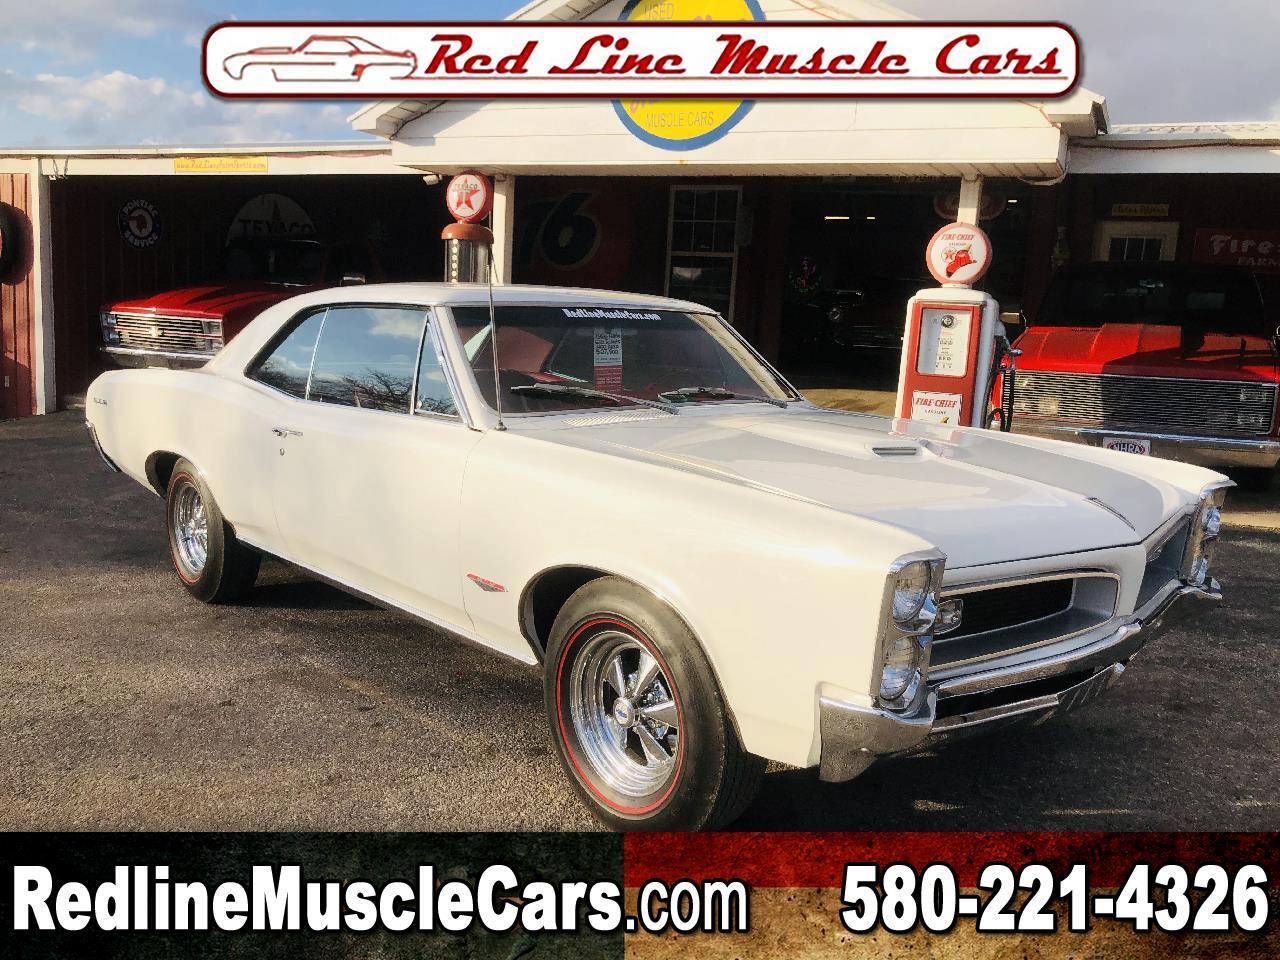 1966 Pontiac Lemans (GTO TRIBUTE)